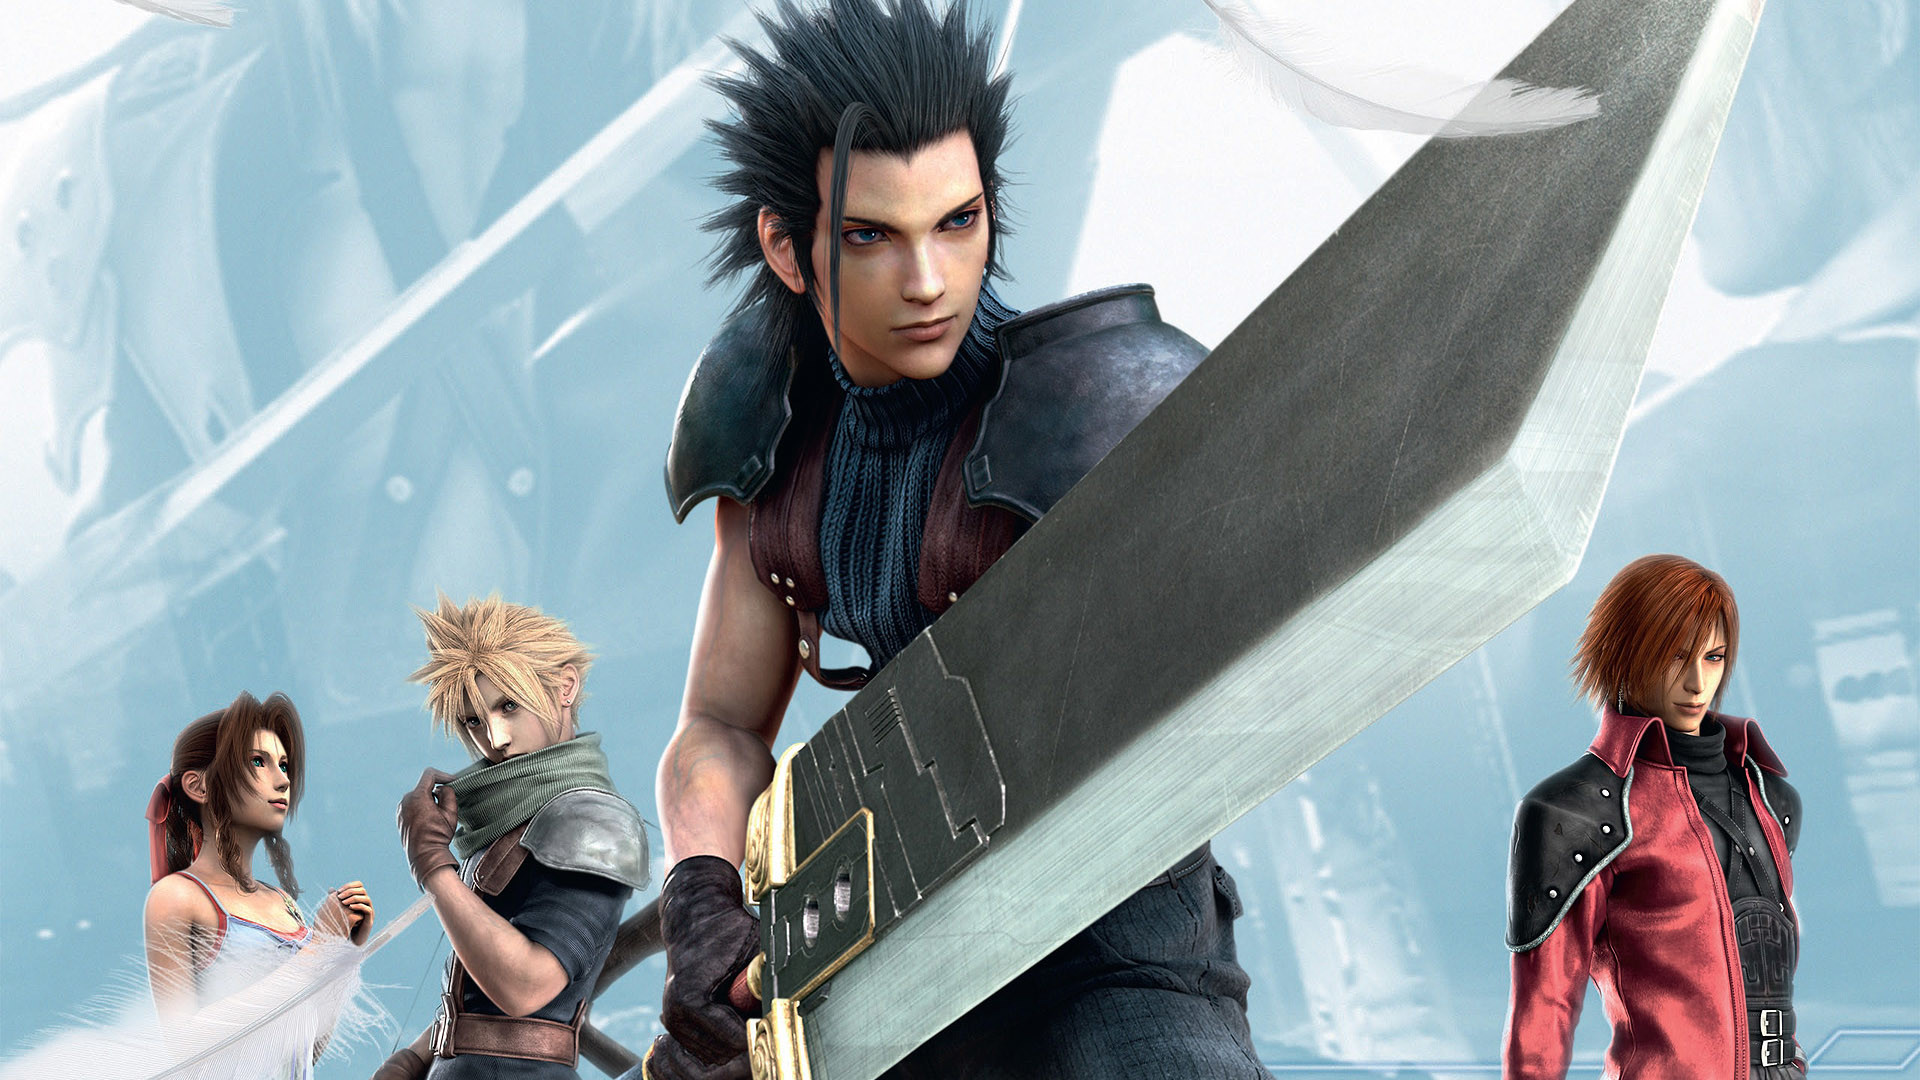 Final Fantasy HD Wallpaper